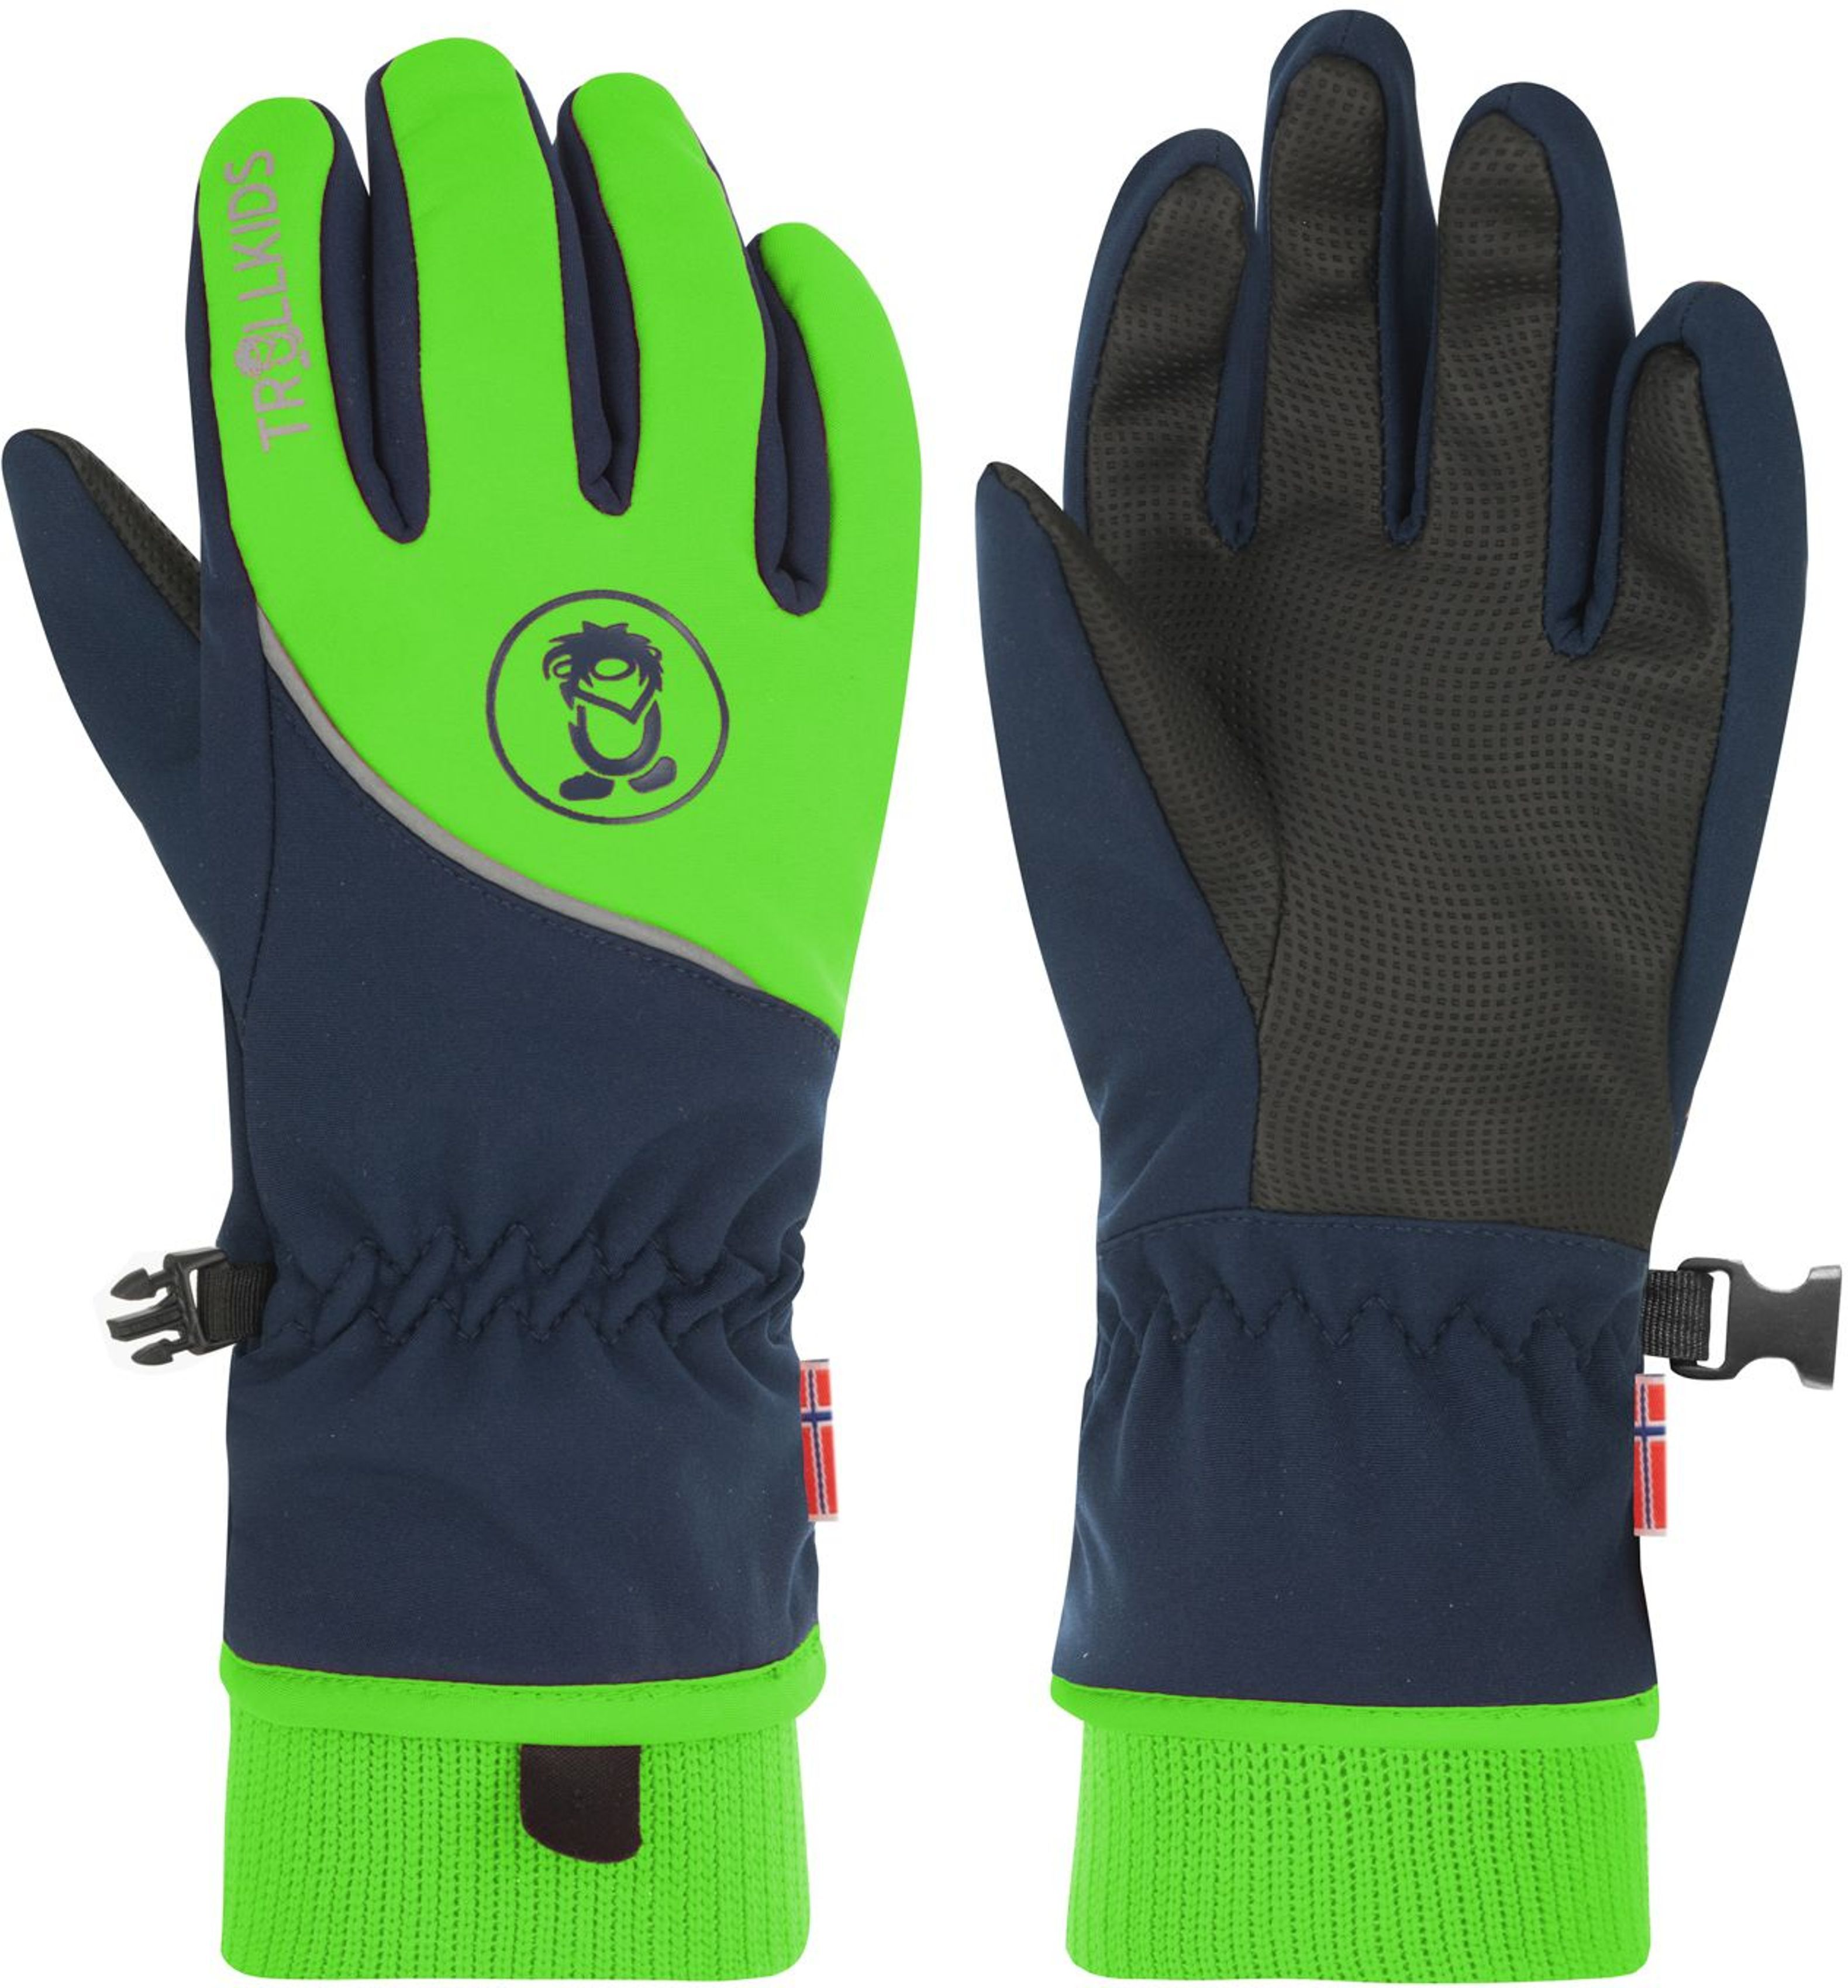 Trollkids Trolltunga Glove Navy/Bright Green